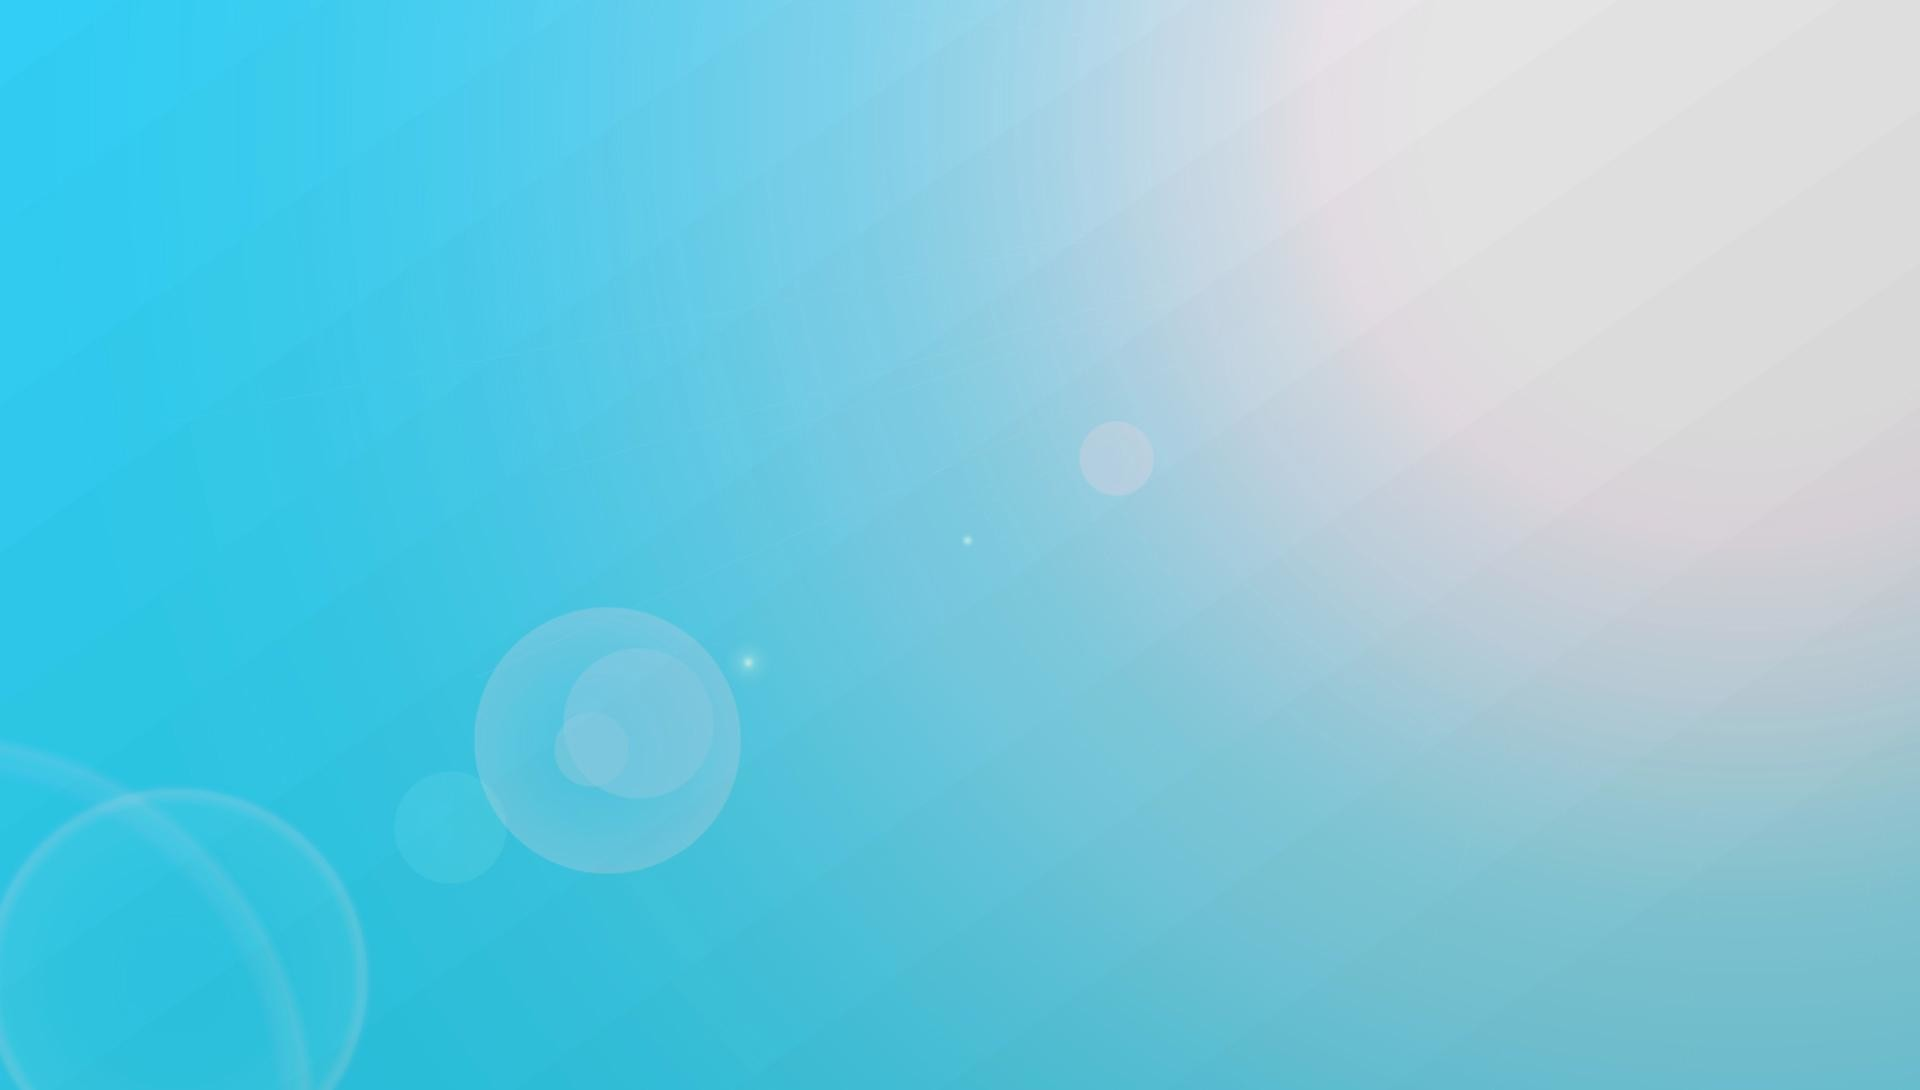 Desktop-Bright-HD-Wallpapers-Free-Download